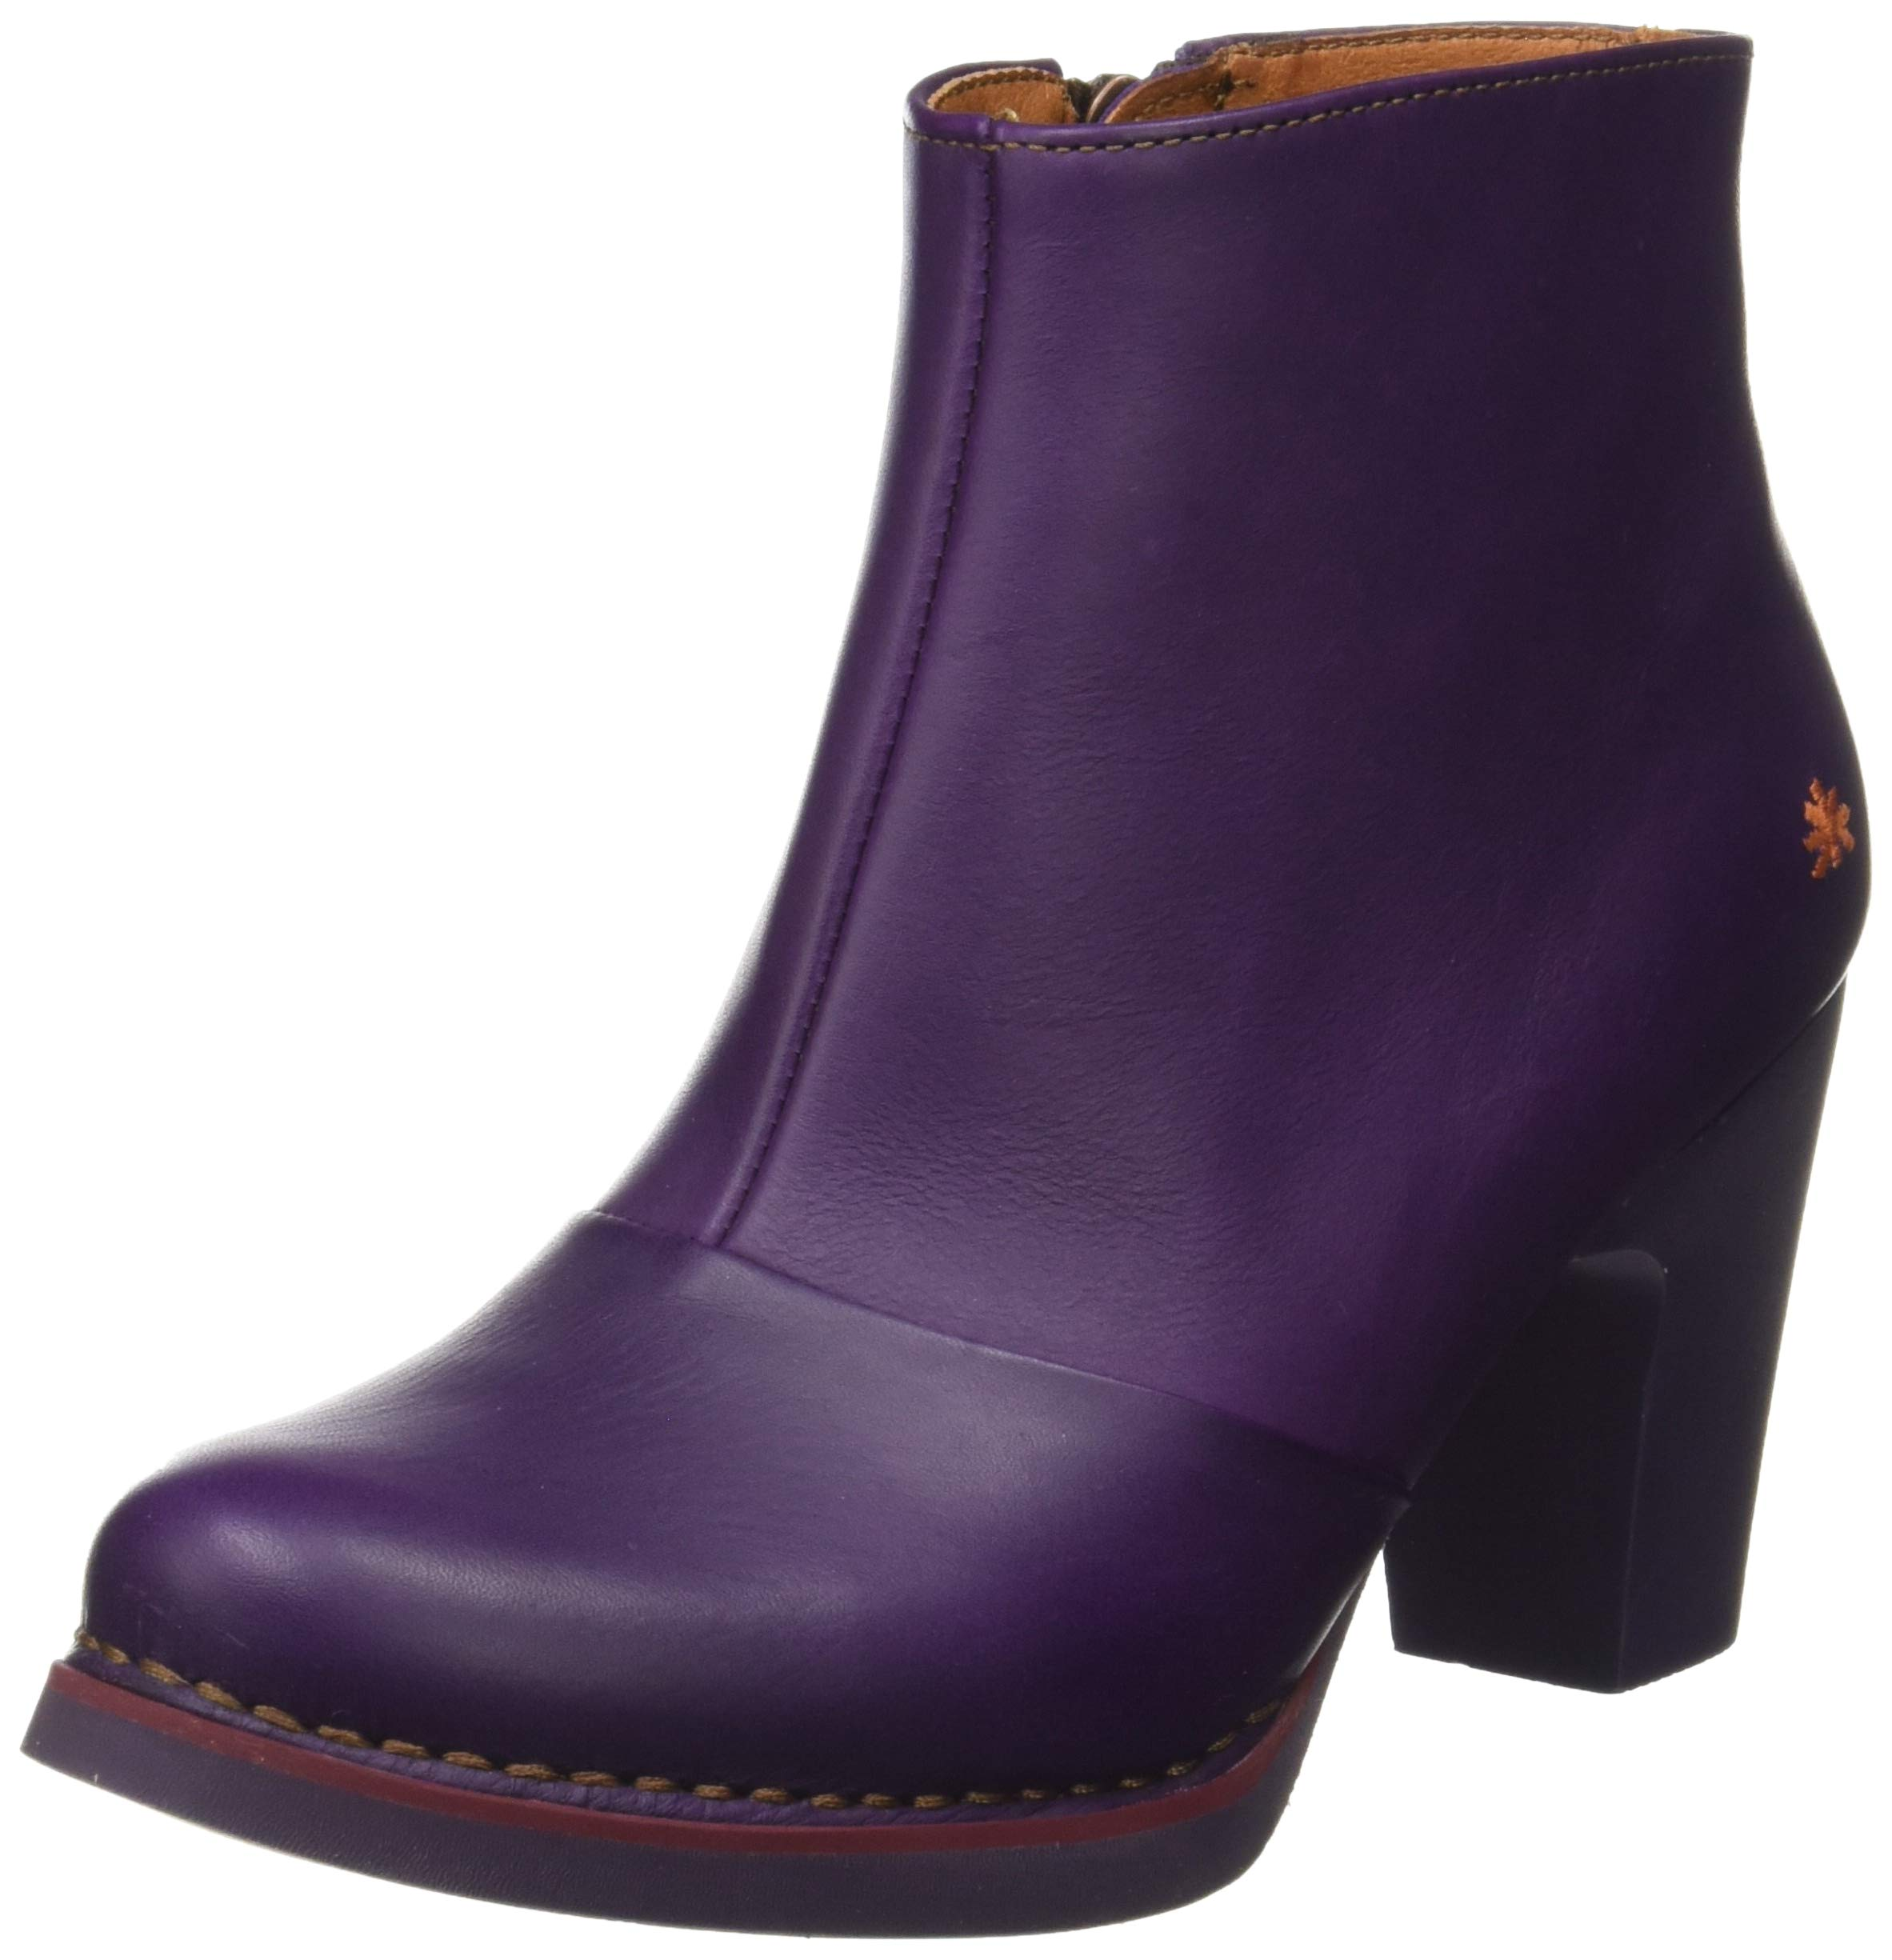 gran ViaBottes Classiques FemmeViolet39 Grass Eu 1142 Purple Art CWEQdorxBe